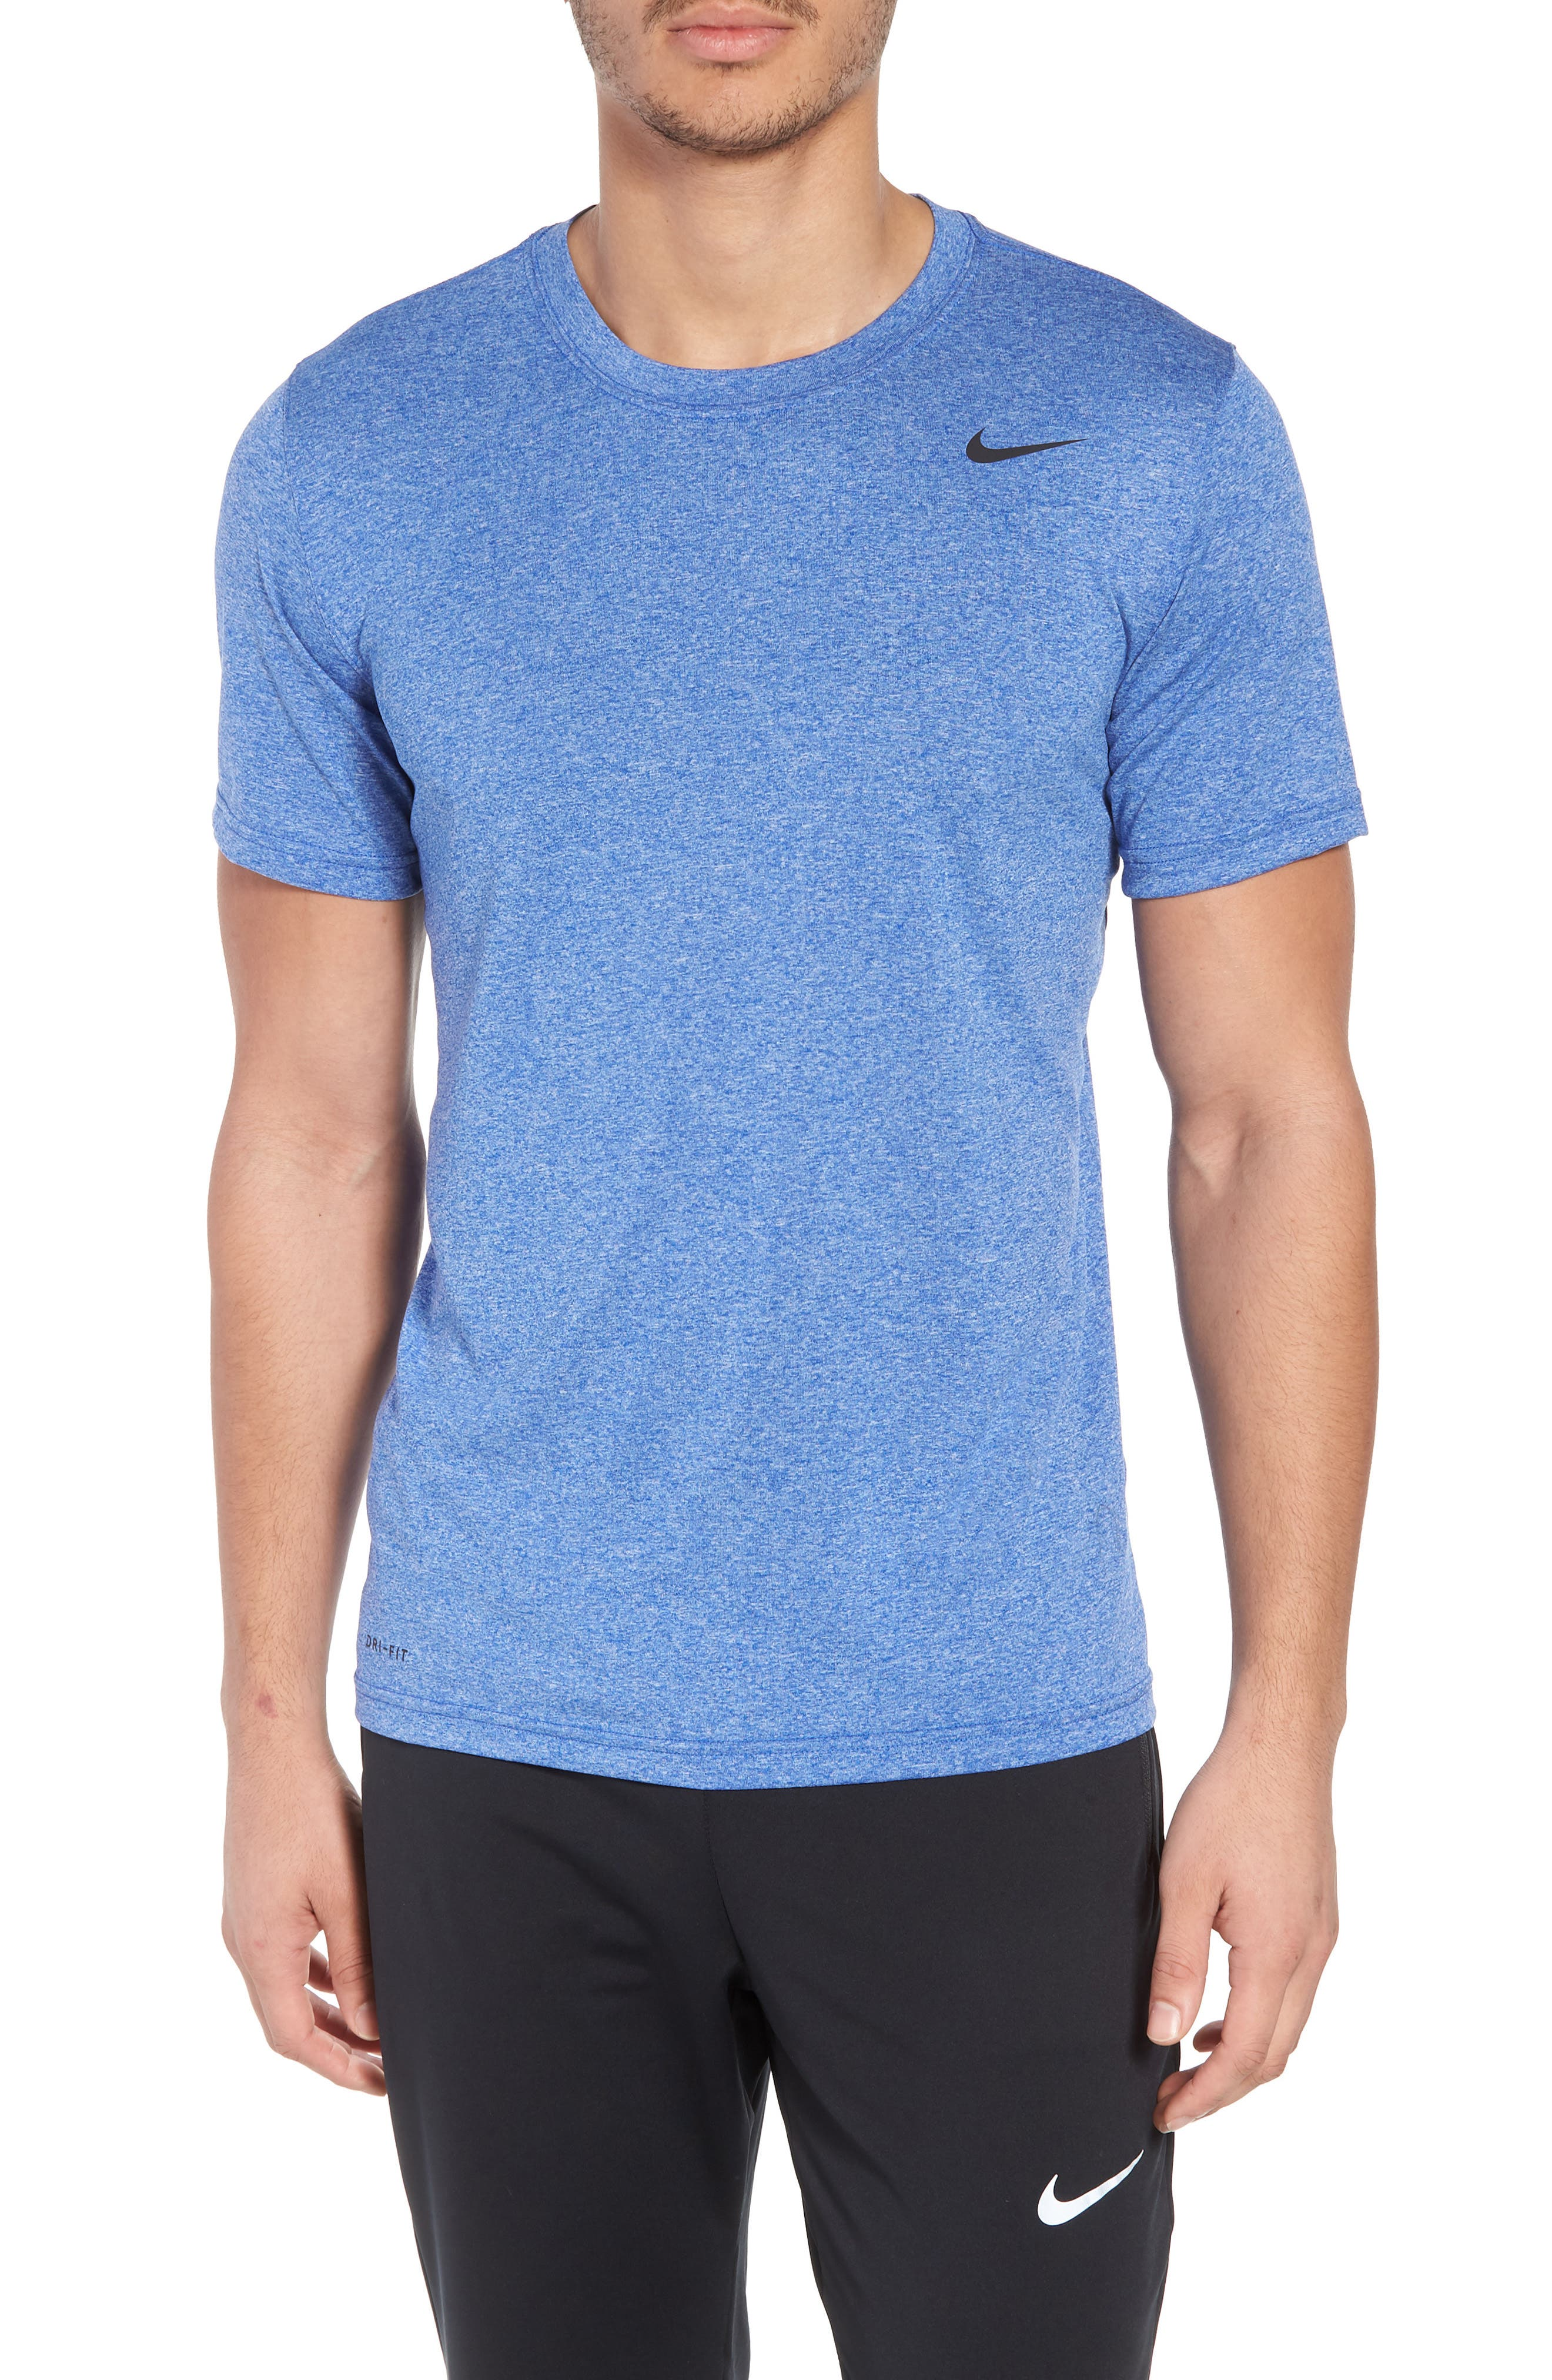 Alternate Image 1 Selected - Nike 'Legend 2.0' Dri-FIT Training T-Shirt